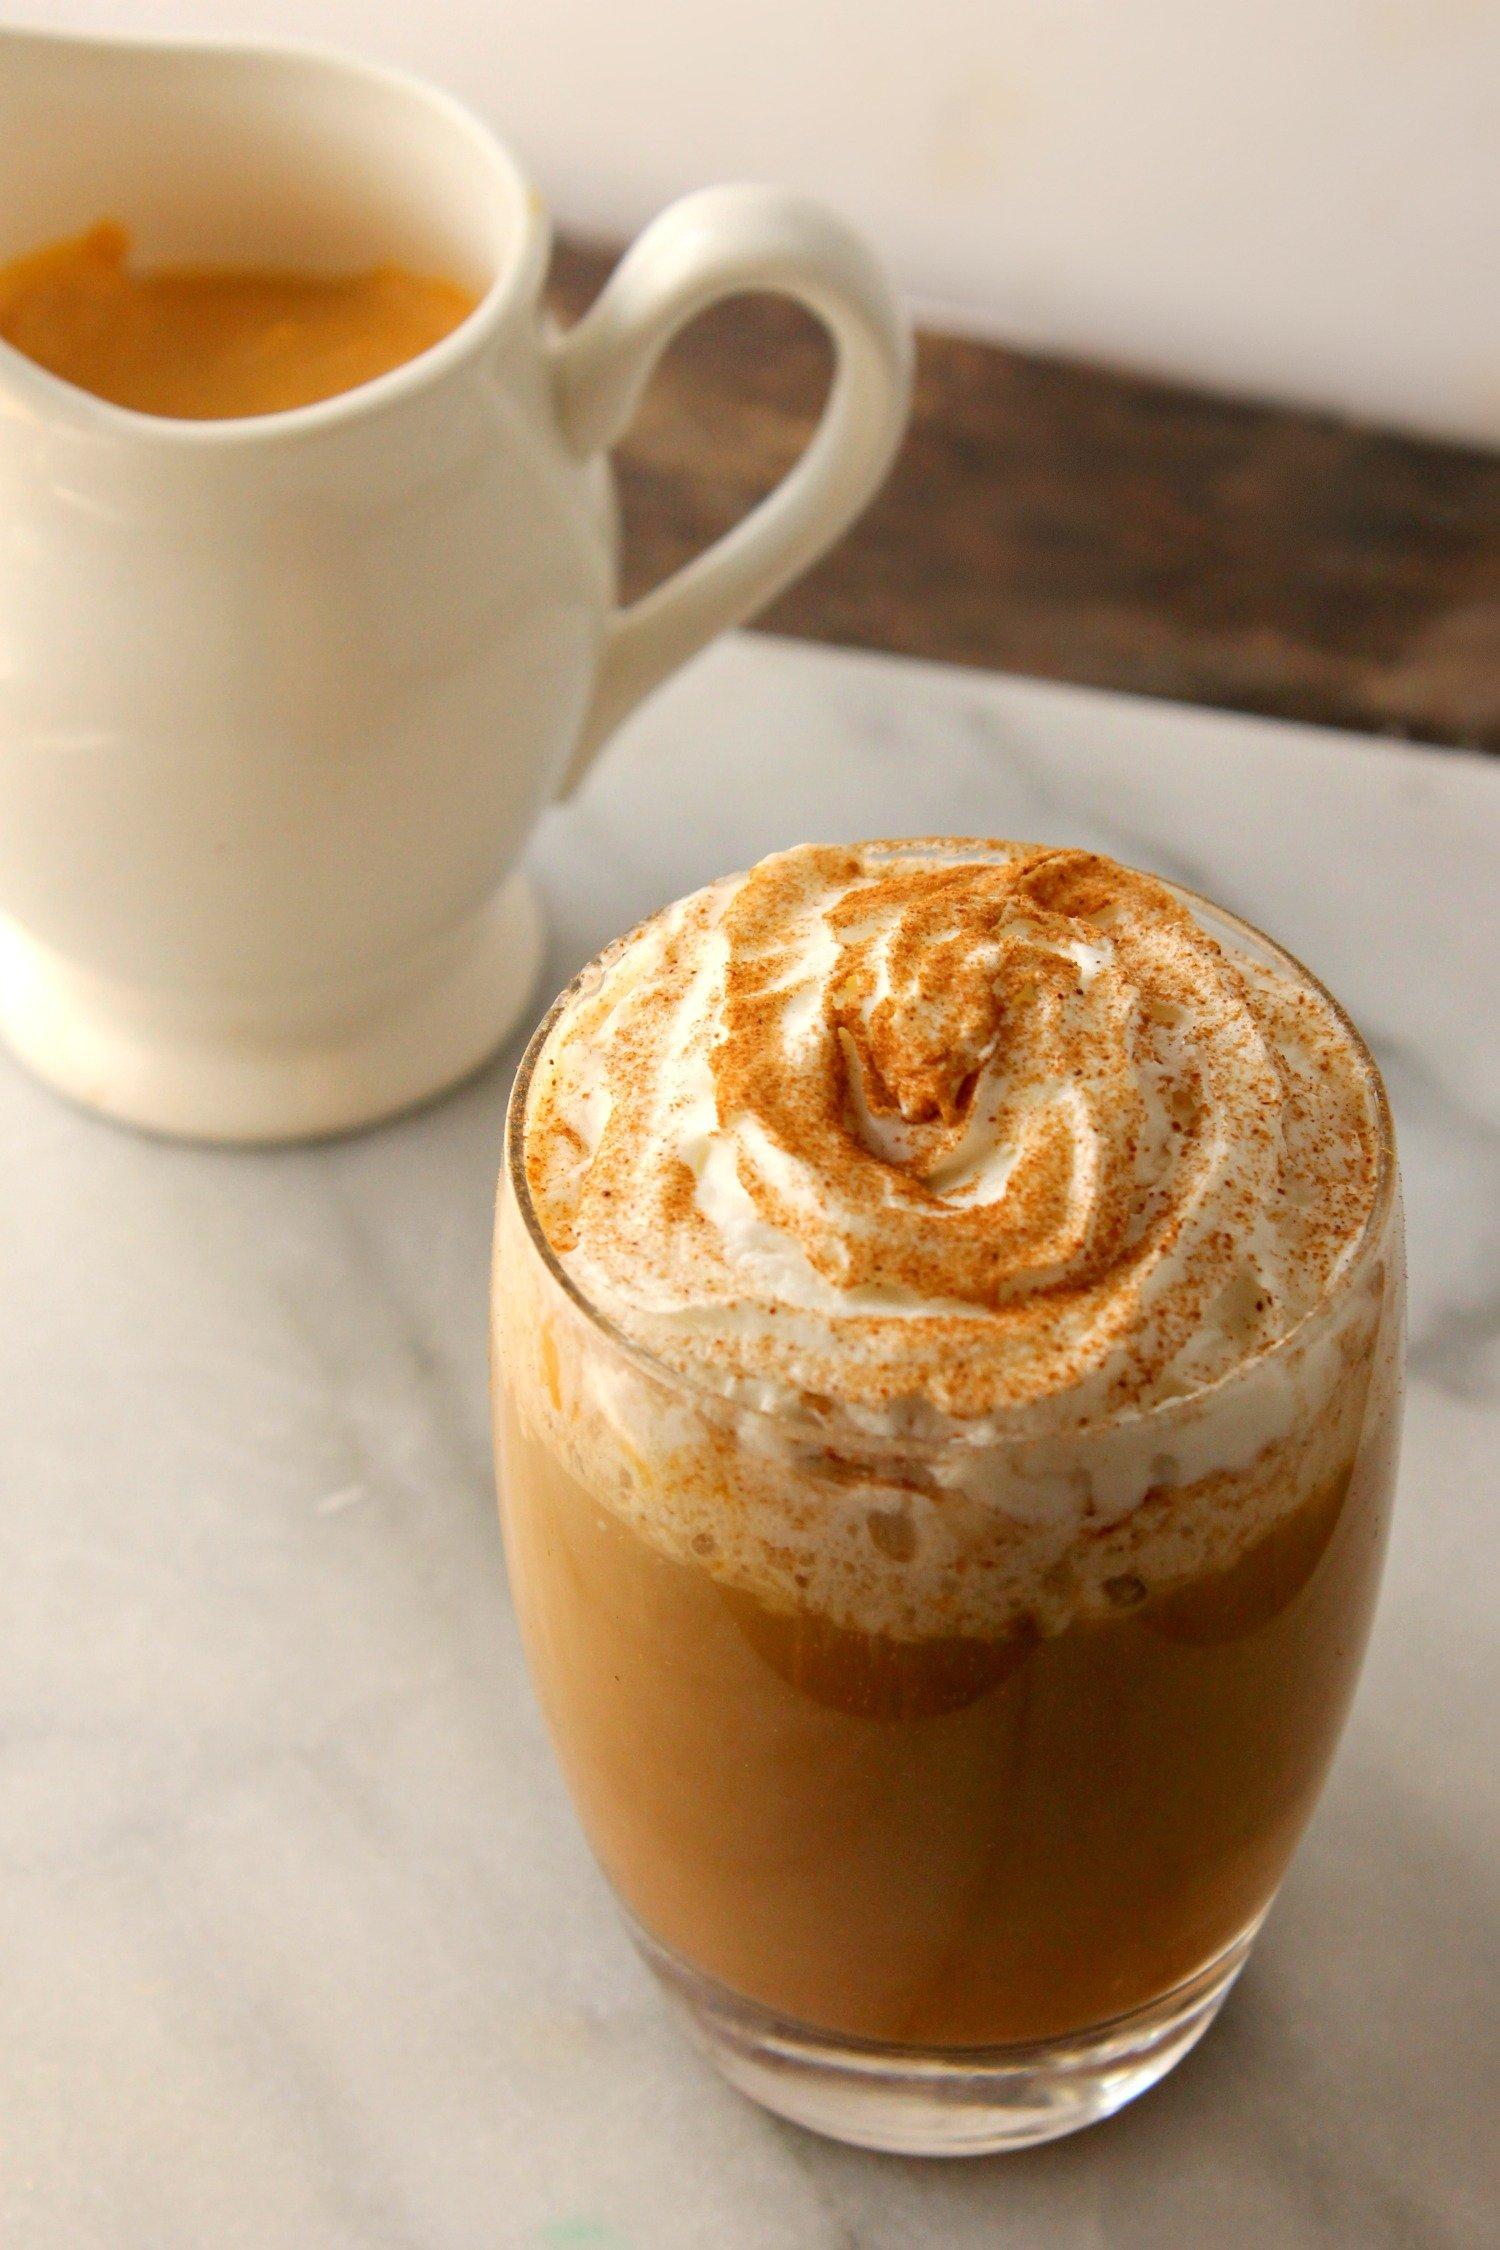 Homemade Pumpkin Spice Coffee Creamer!